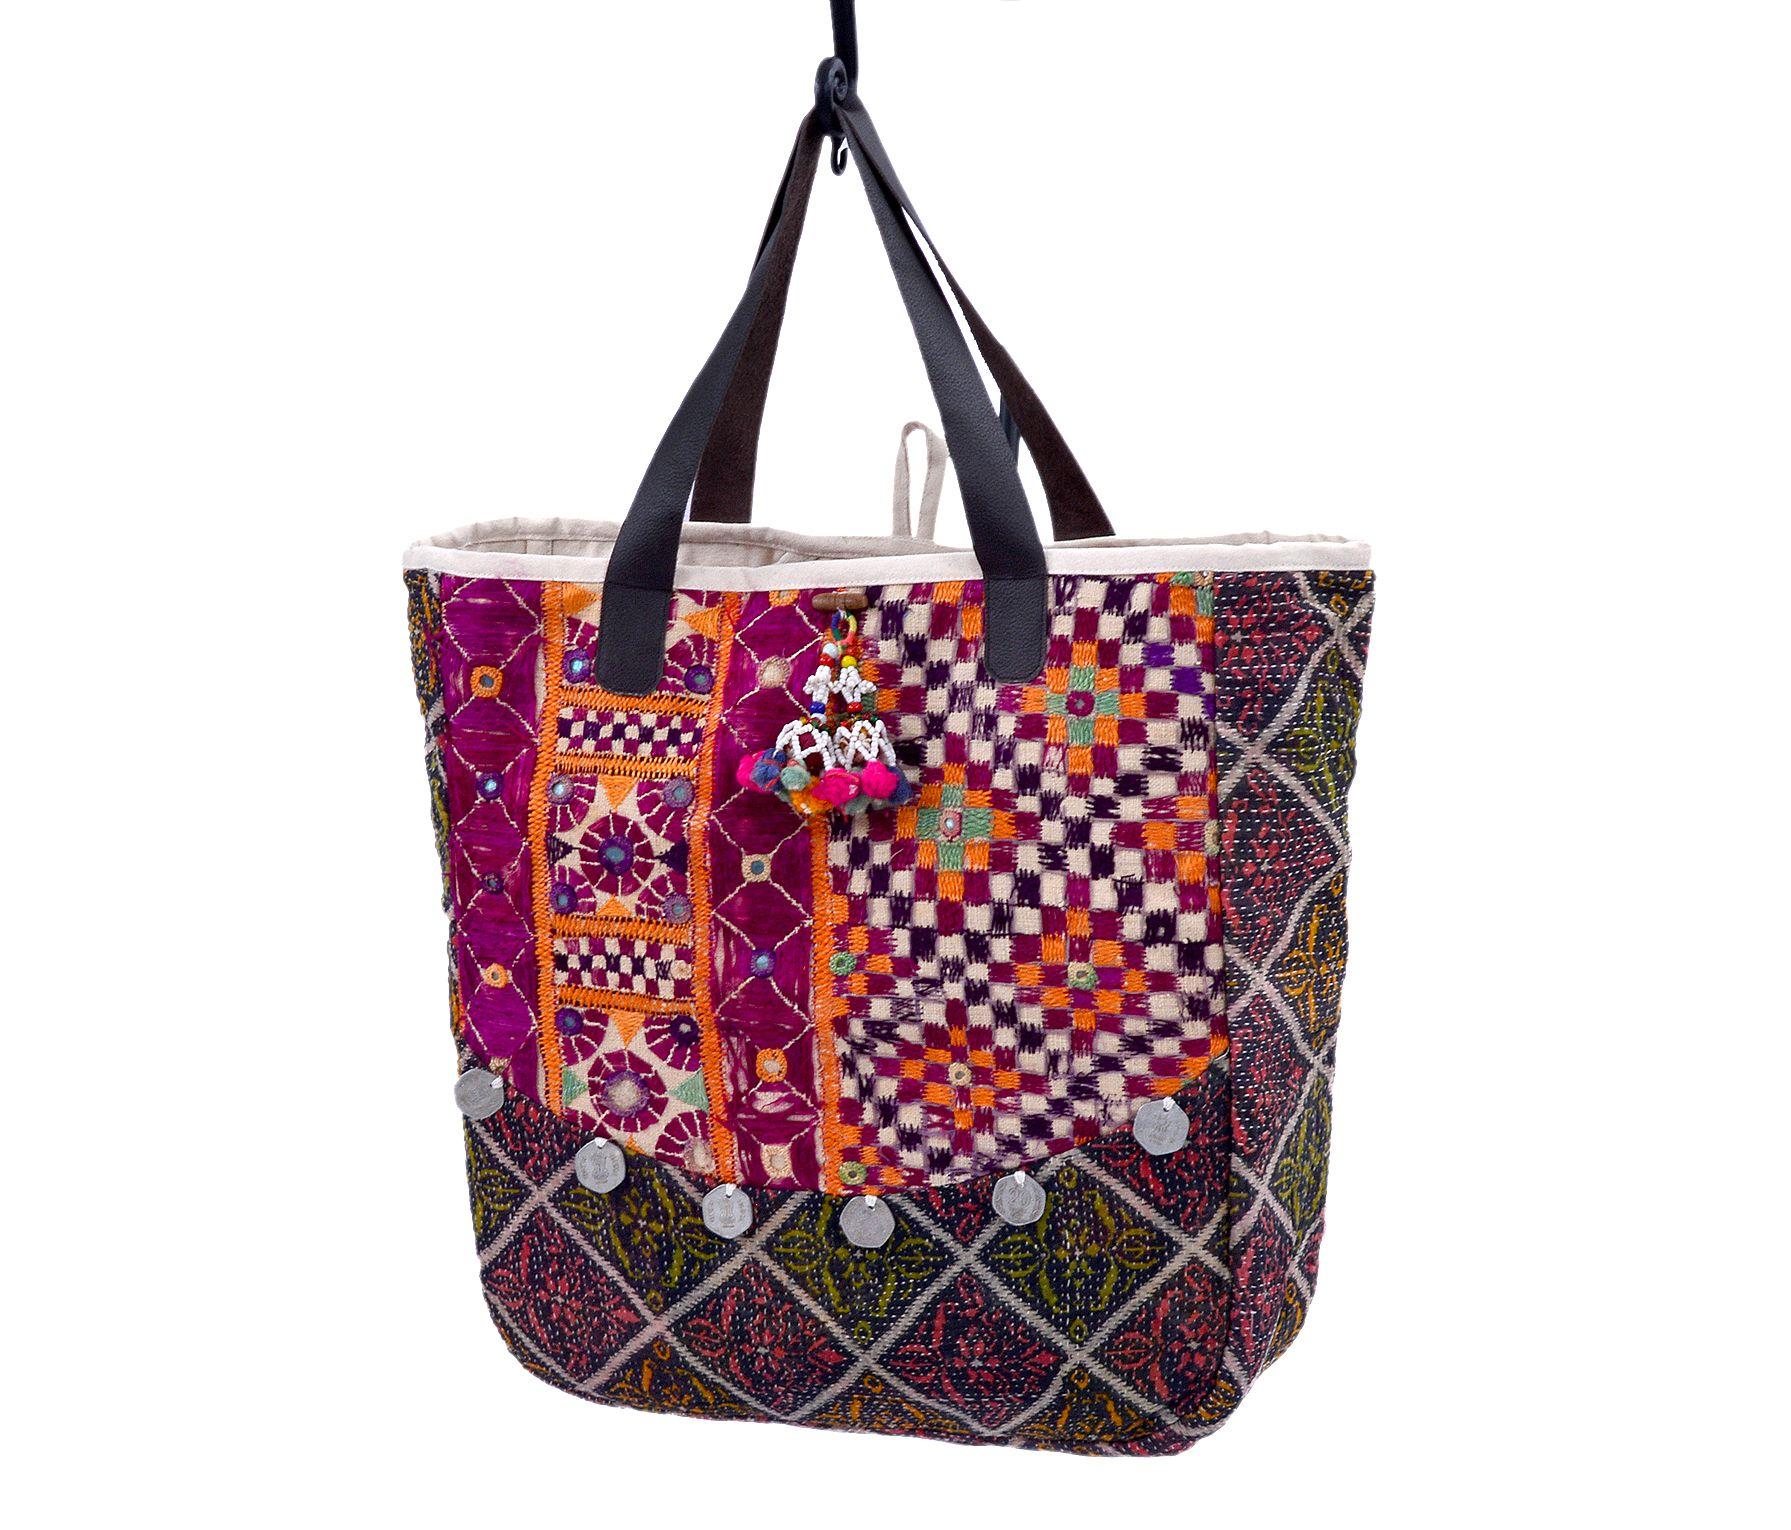 Leather handle banjara bag | Home Furnishings, Furniture, Kilim Rugs, Pillows, Online Shopping, Online Shopping Ottomans @ NaturalFurnish.co...